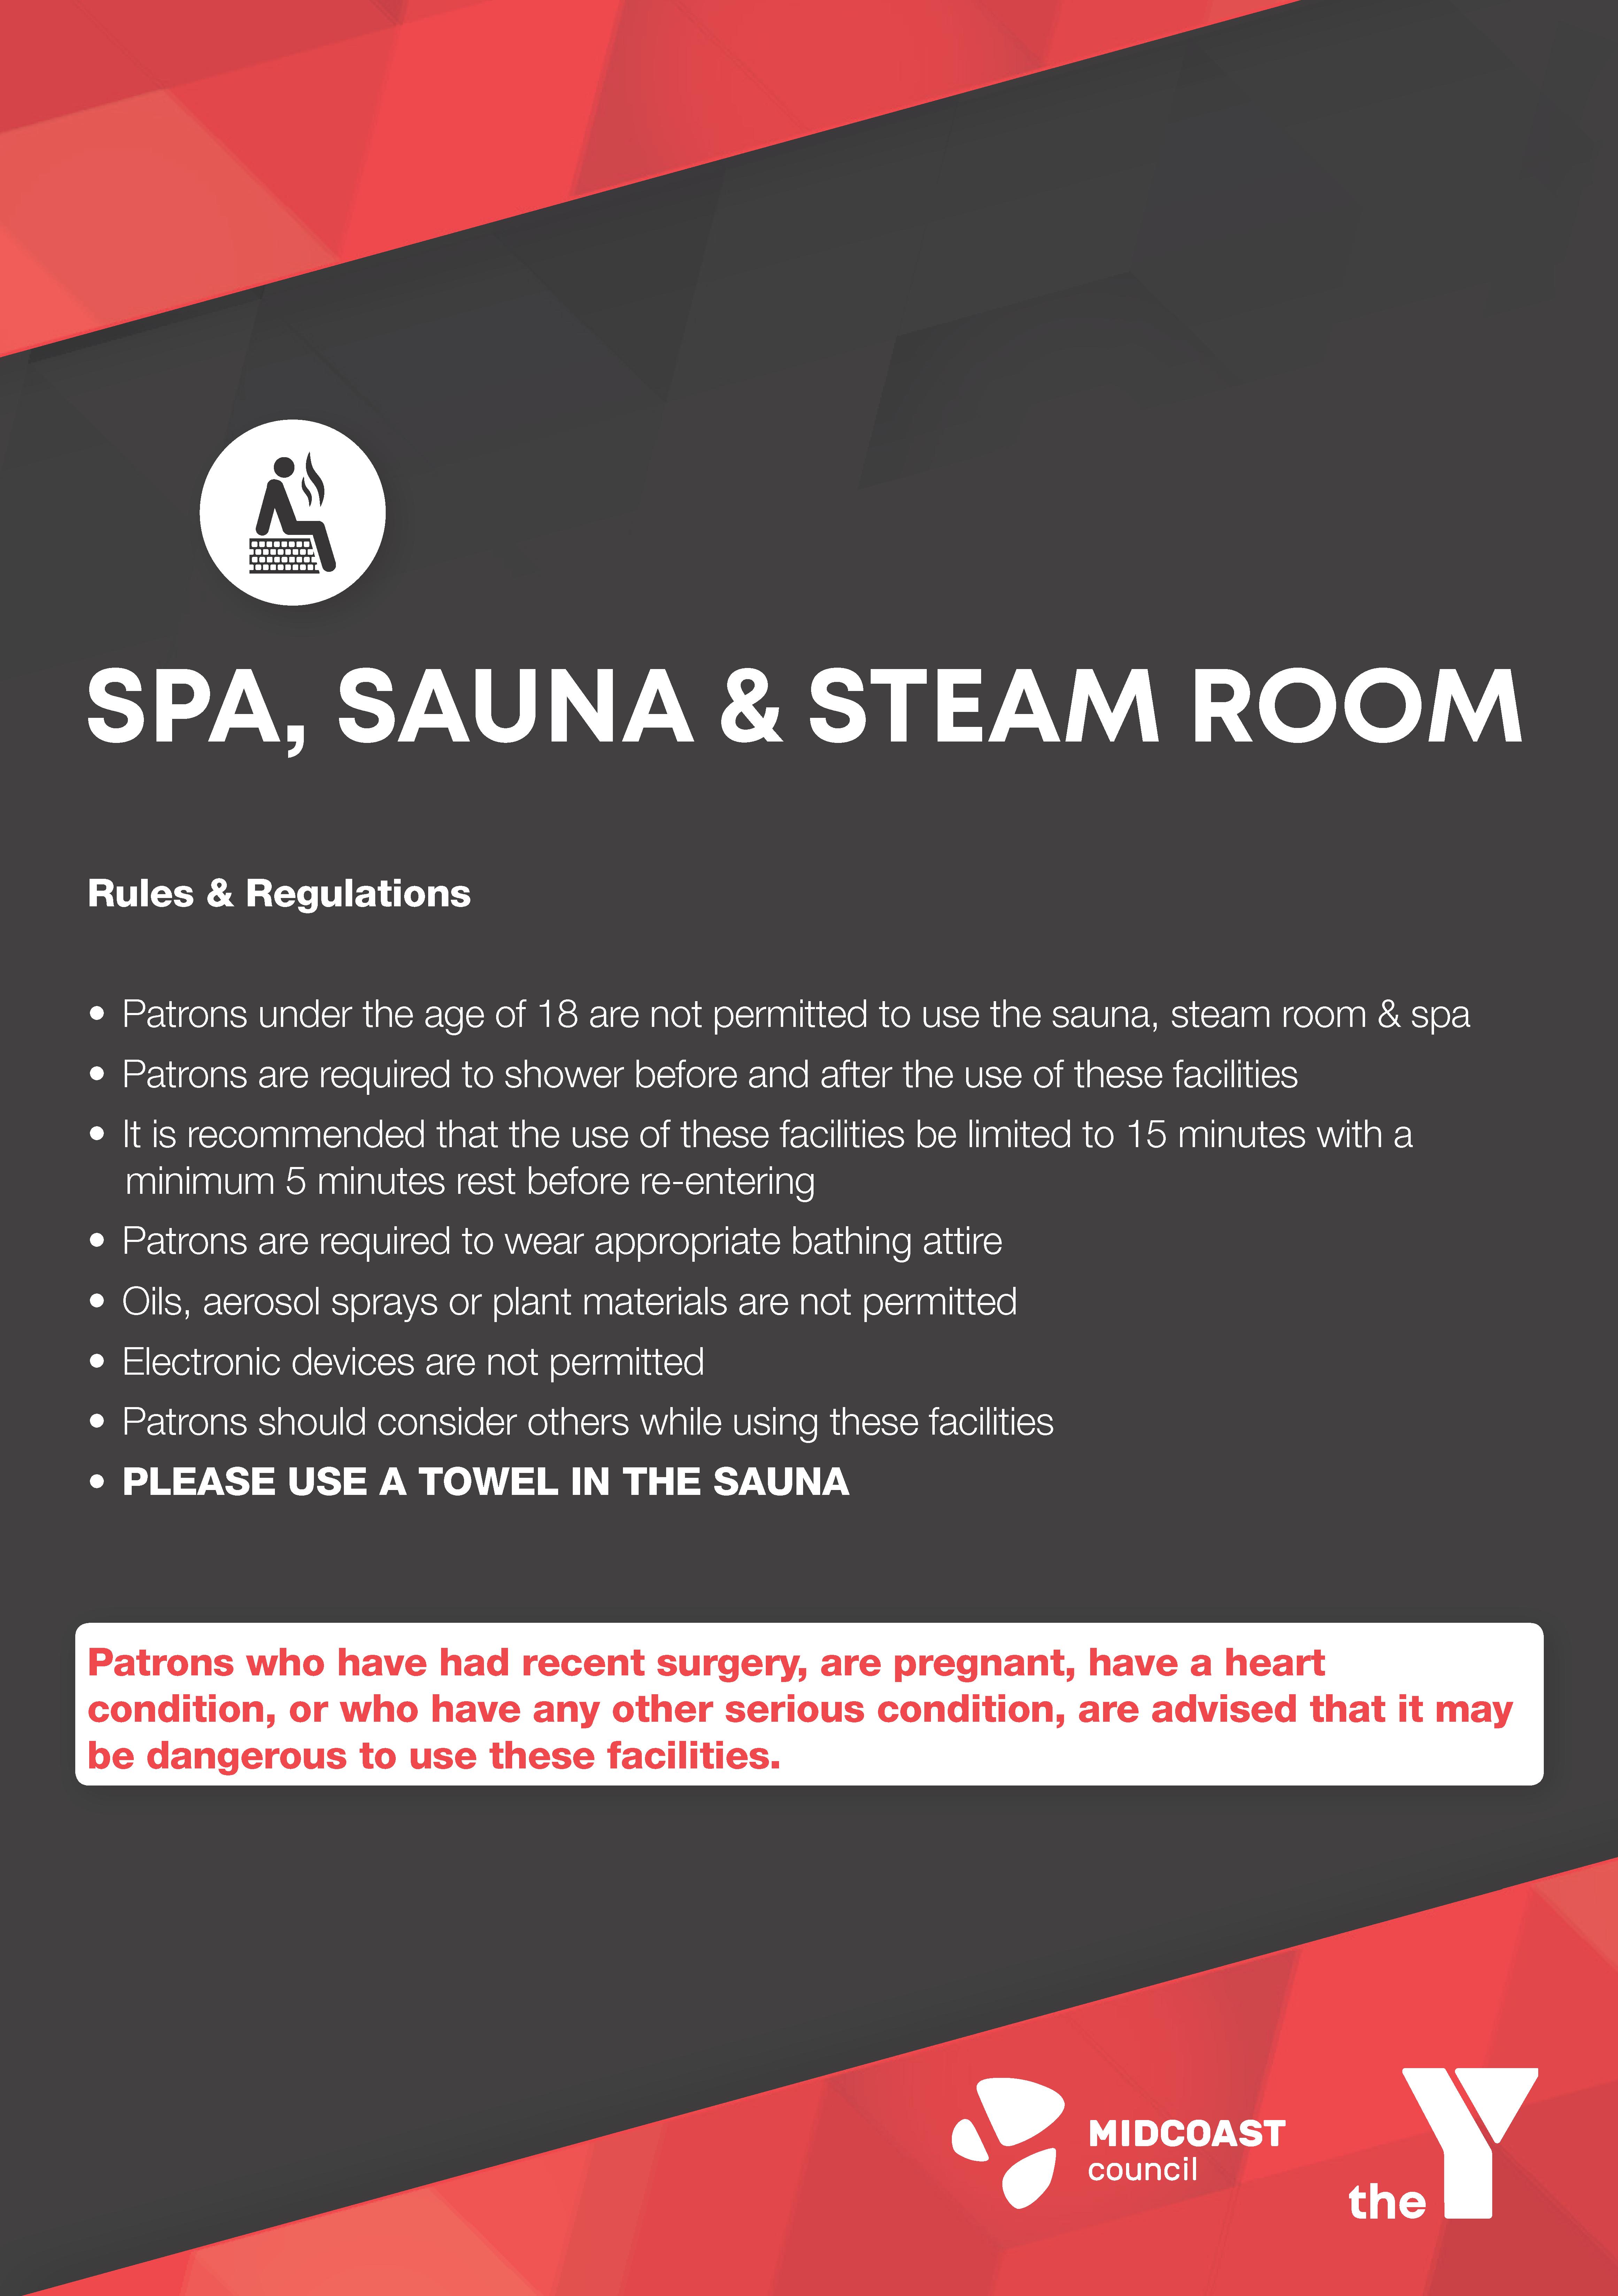 Spa, Sauna and Steam Room